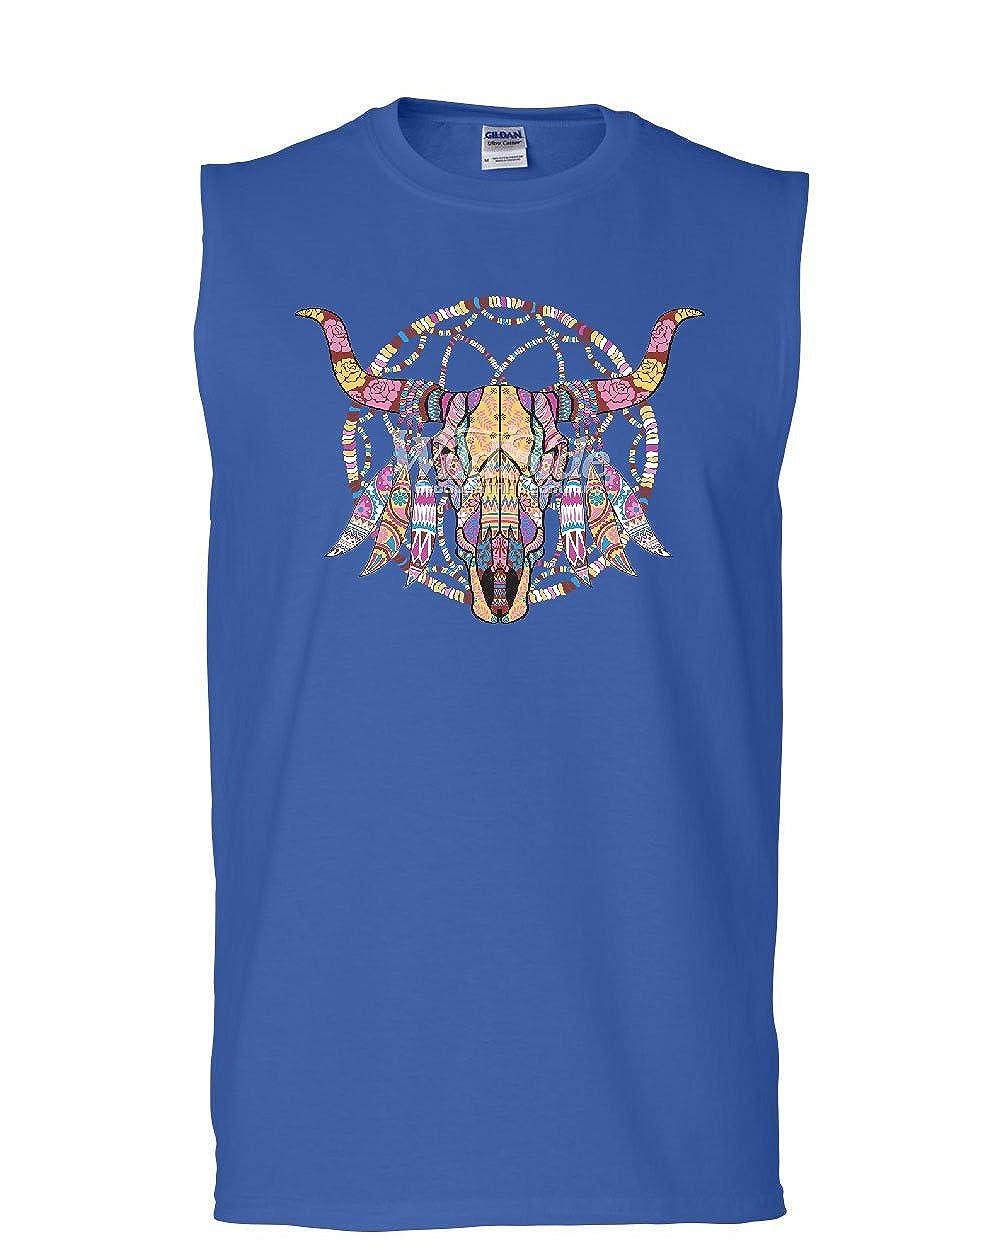 Tee Hunt Mosaic Art Dreamcatcher Cow Skull Muscle Shirt Tribal Nature Indian Sleeveless